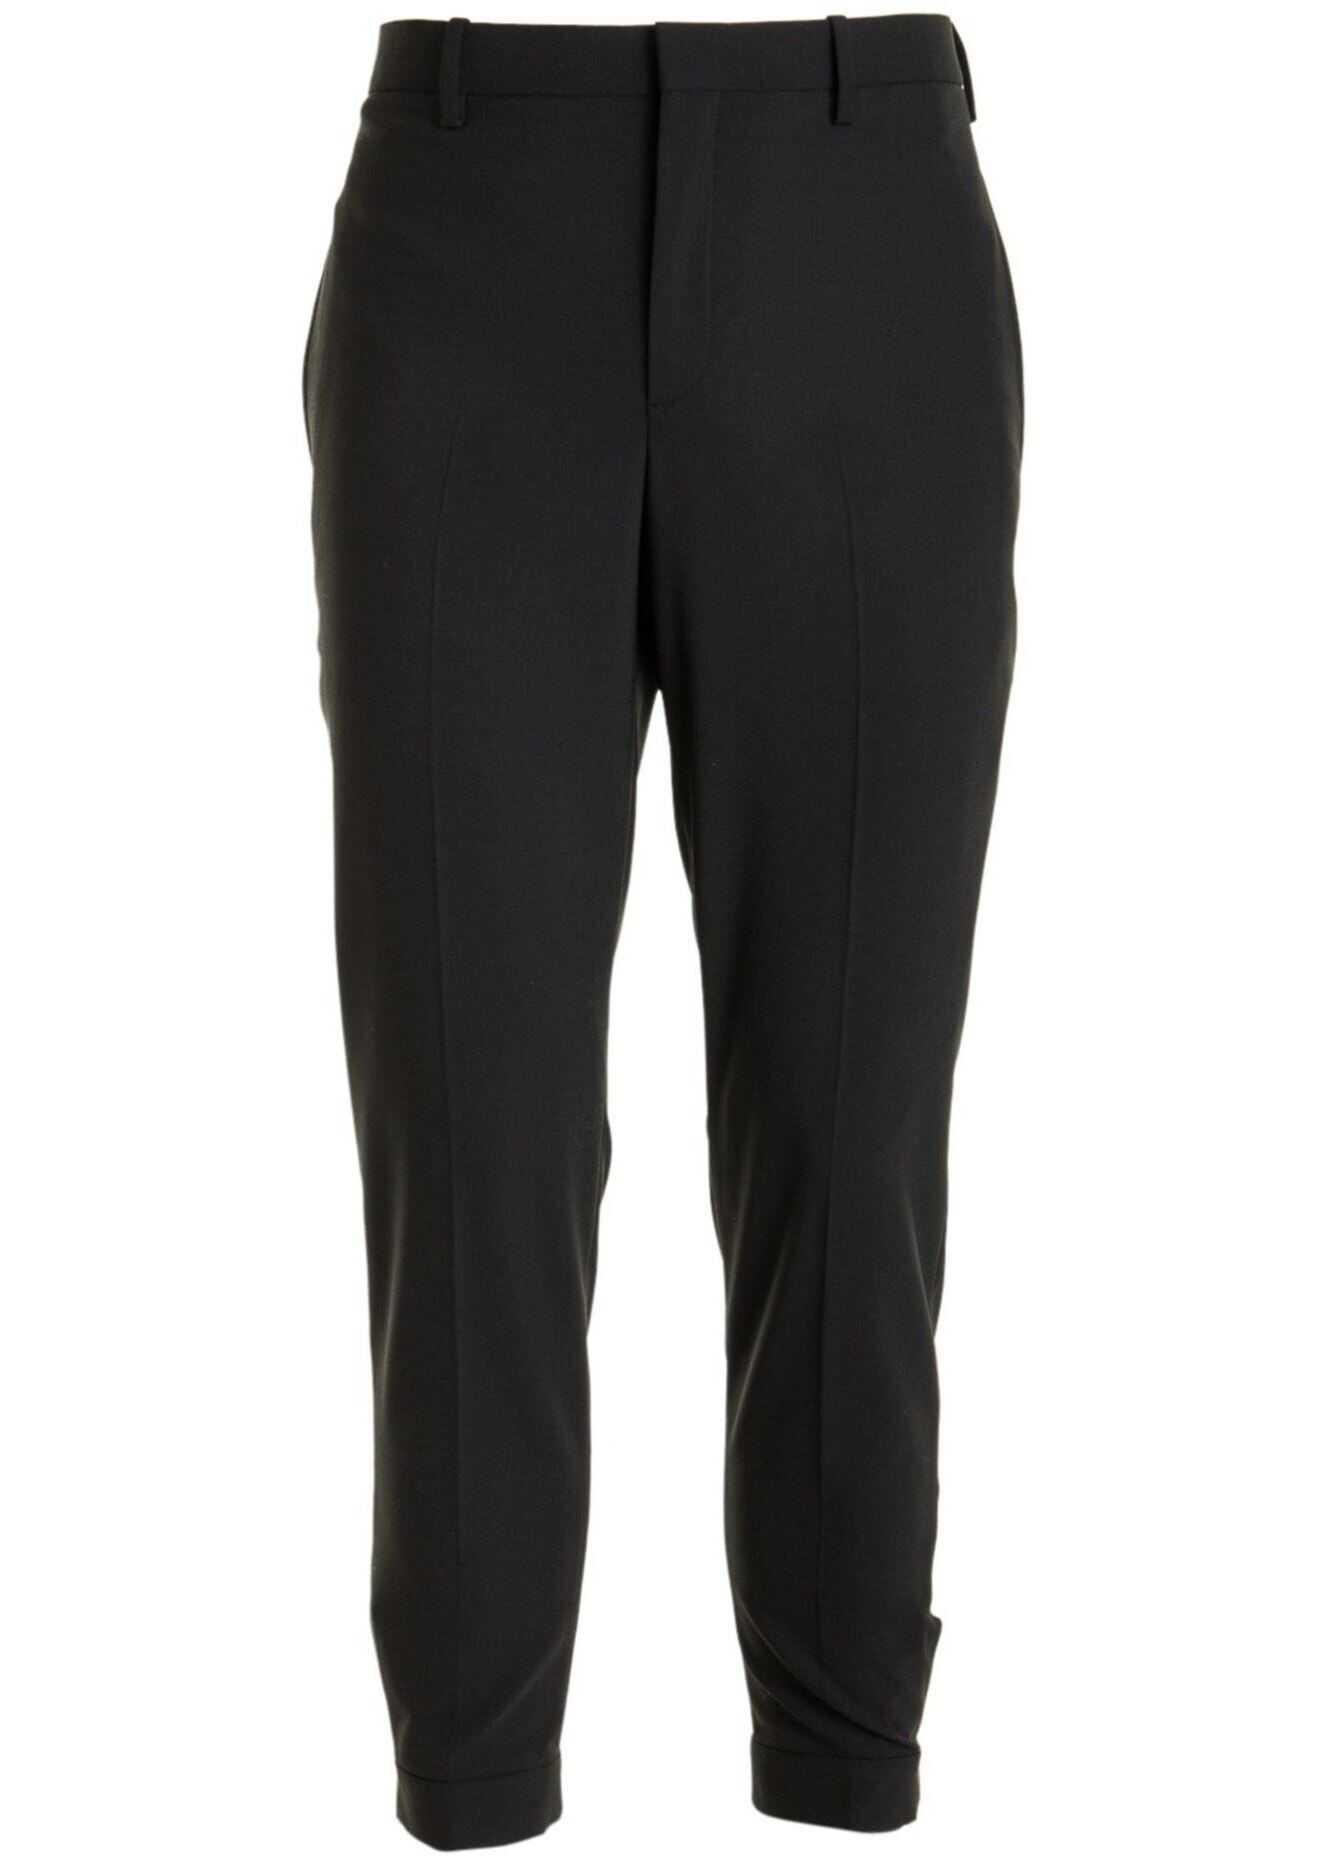 Neil Barrett Decorative Zip Trousers Black imagine